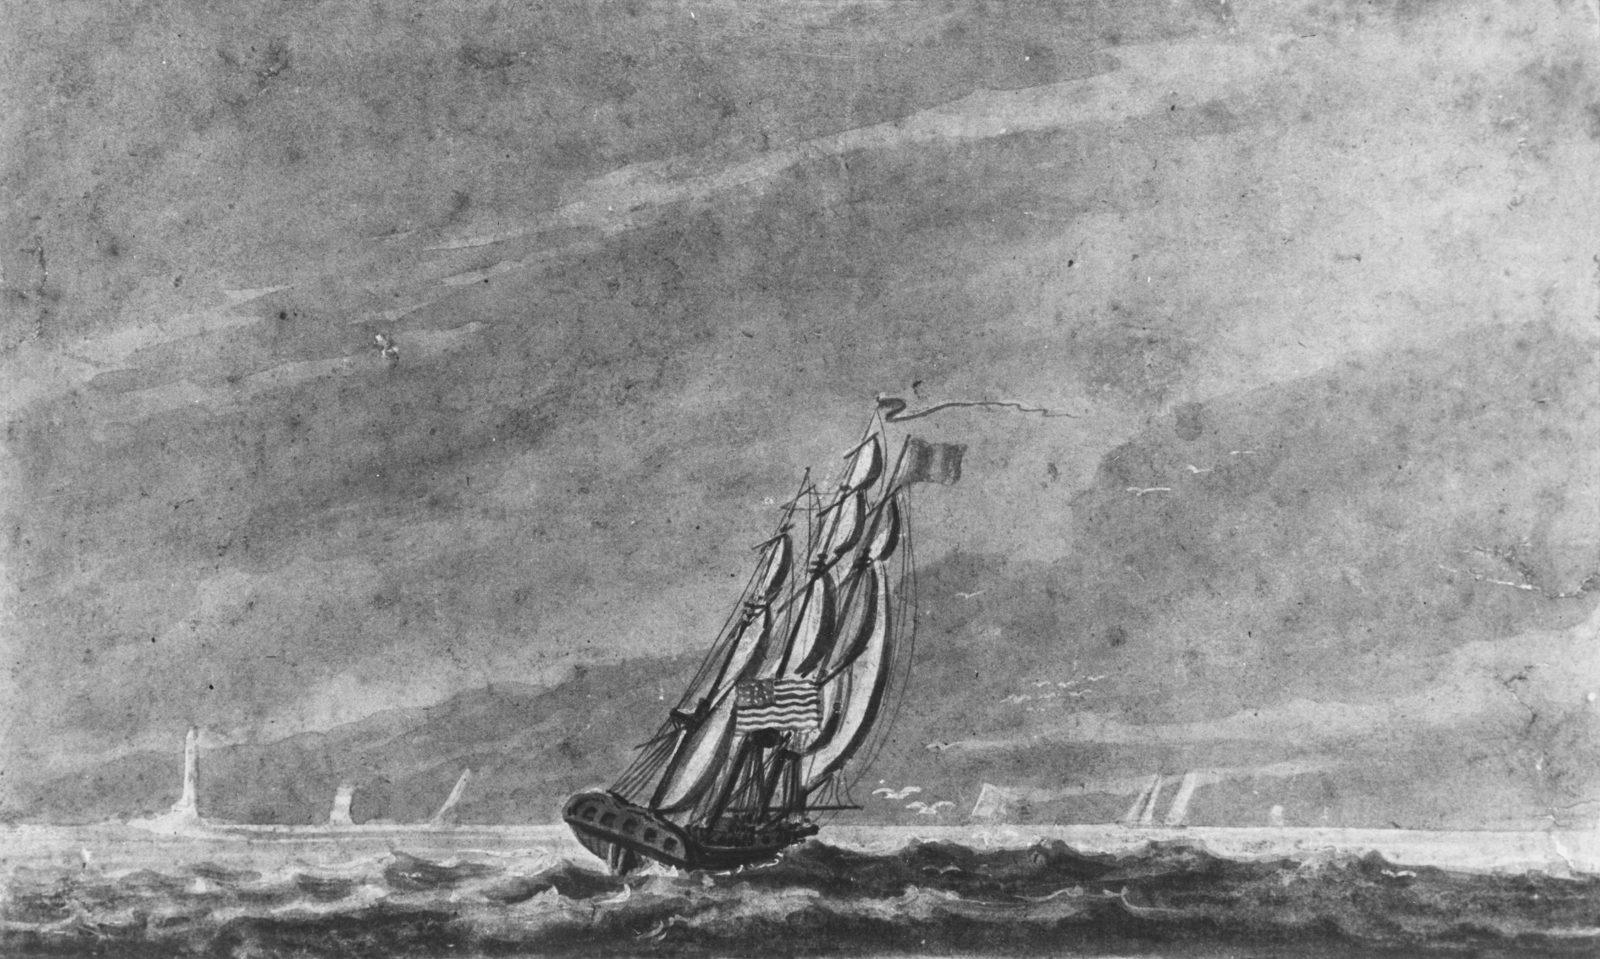 Full Sail off Sandy Hook—Entrance to New York Harbor